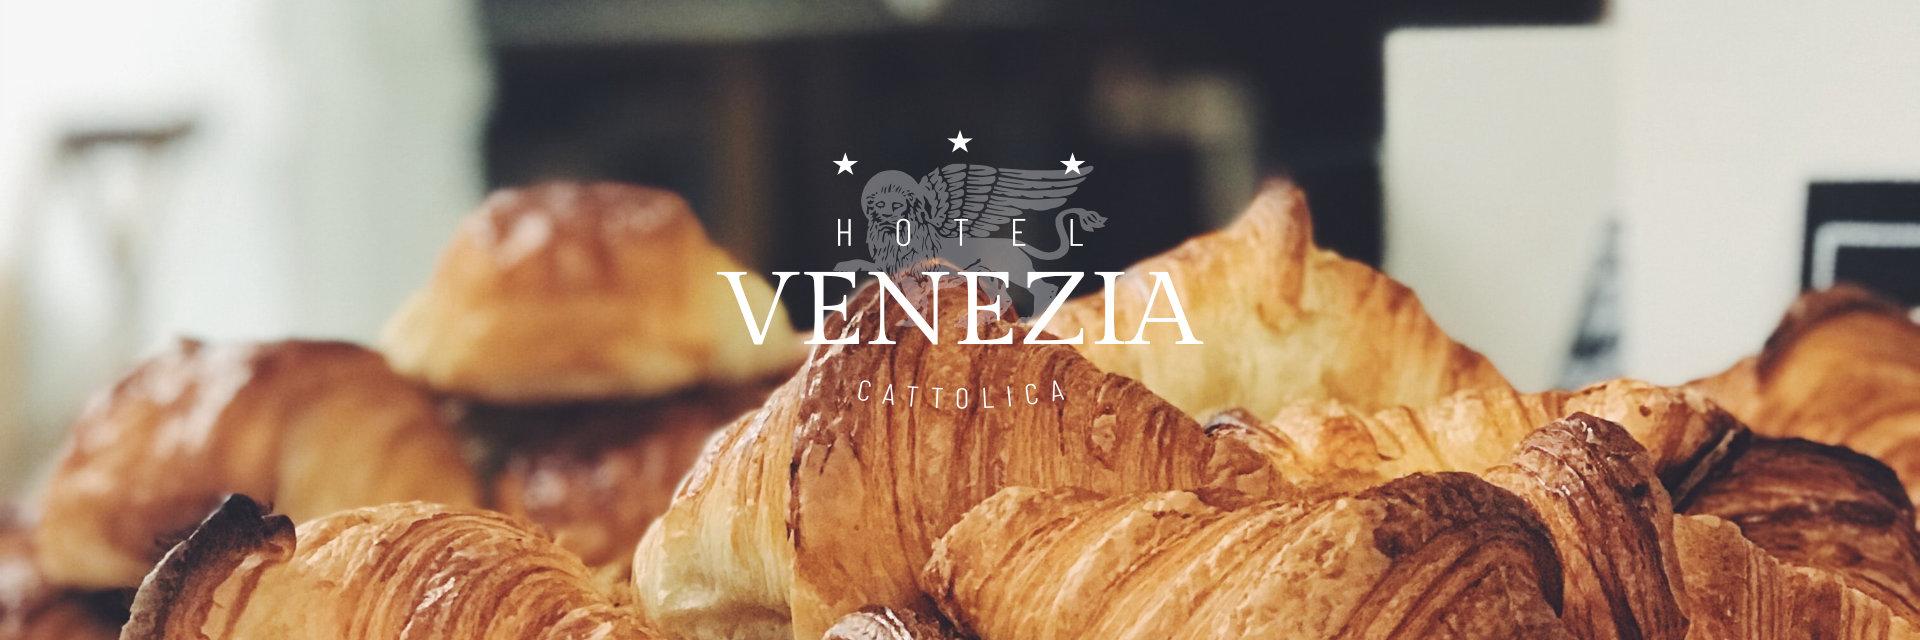 Hotel Venezia - Just Bed Hotel